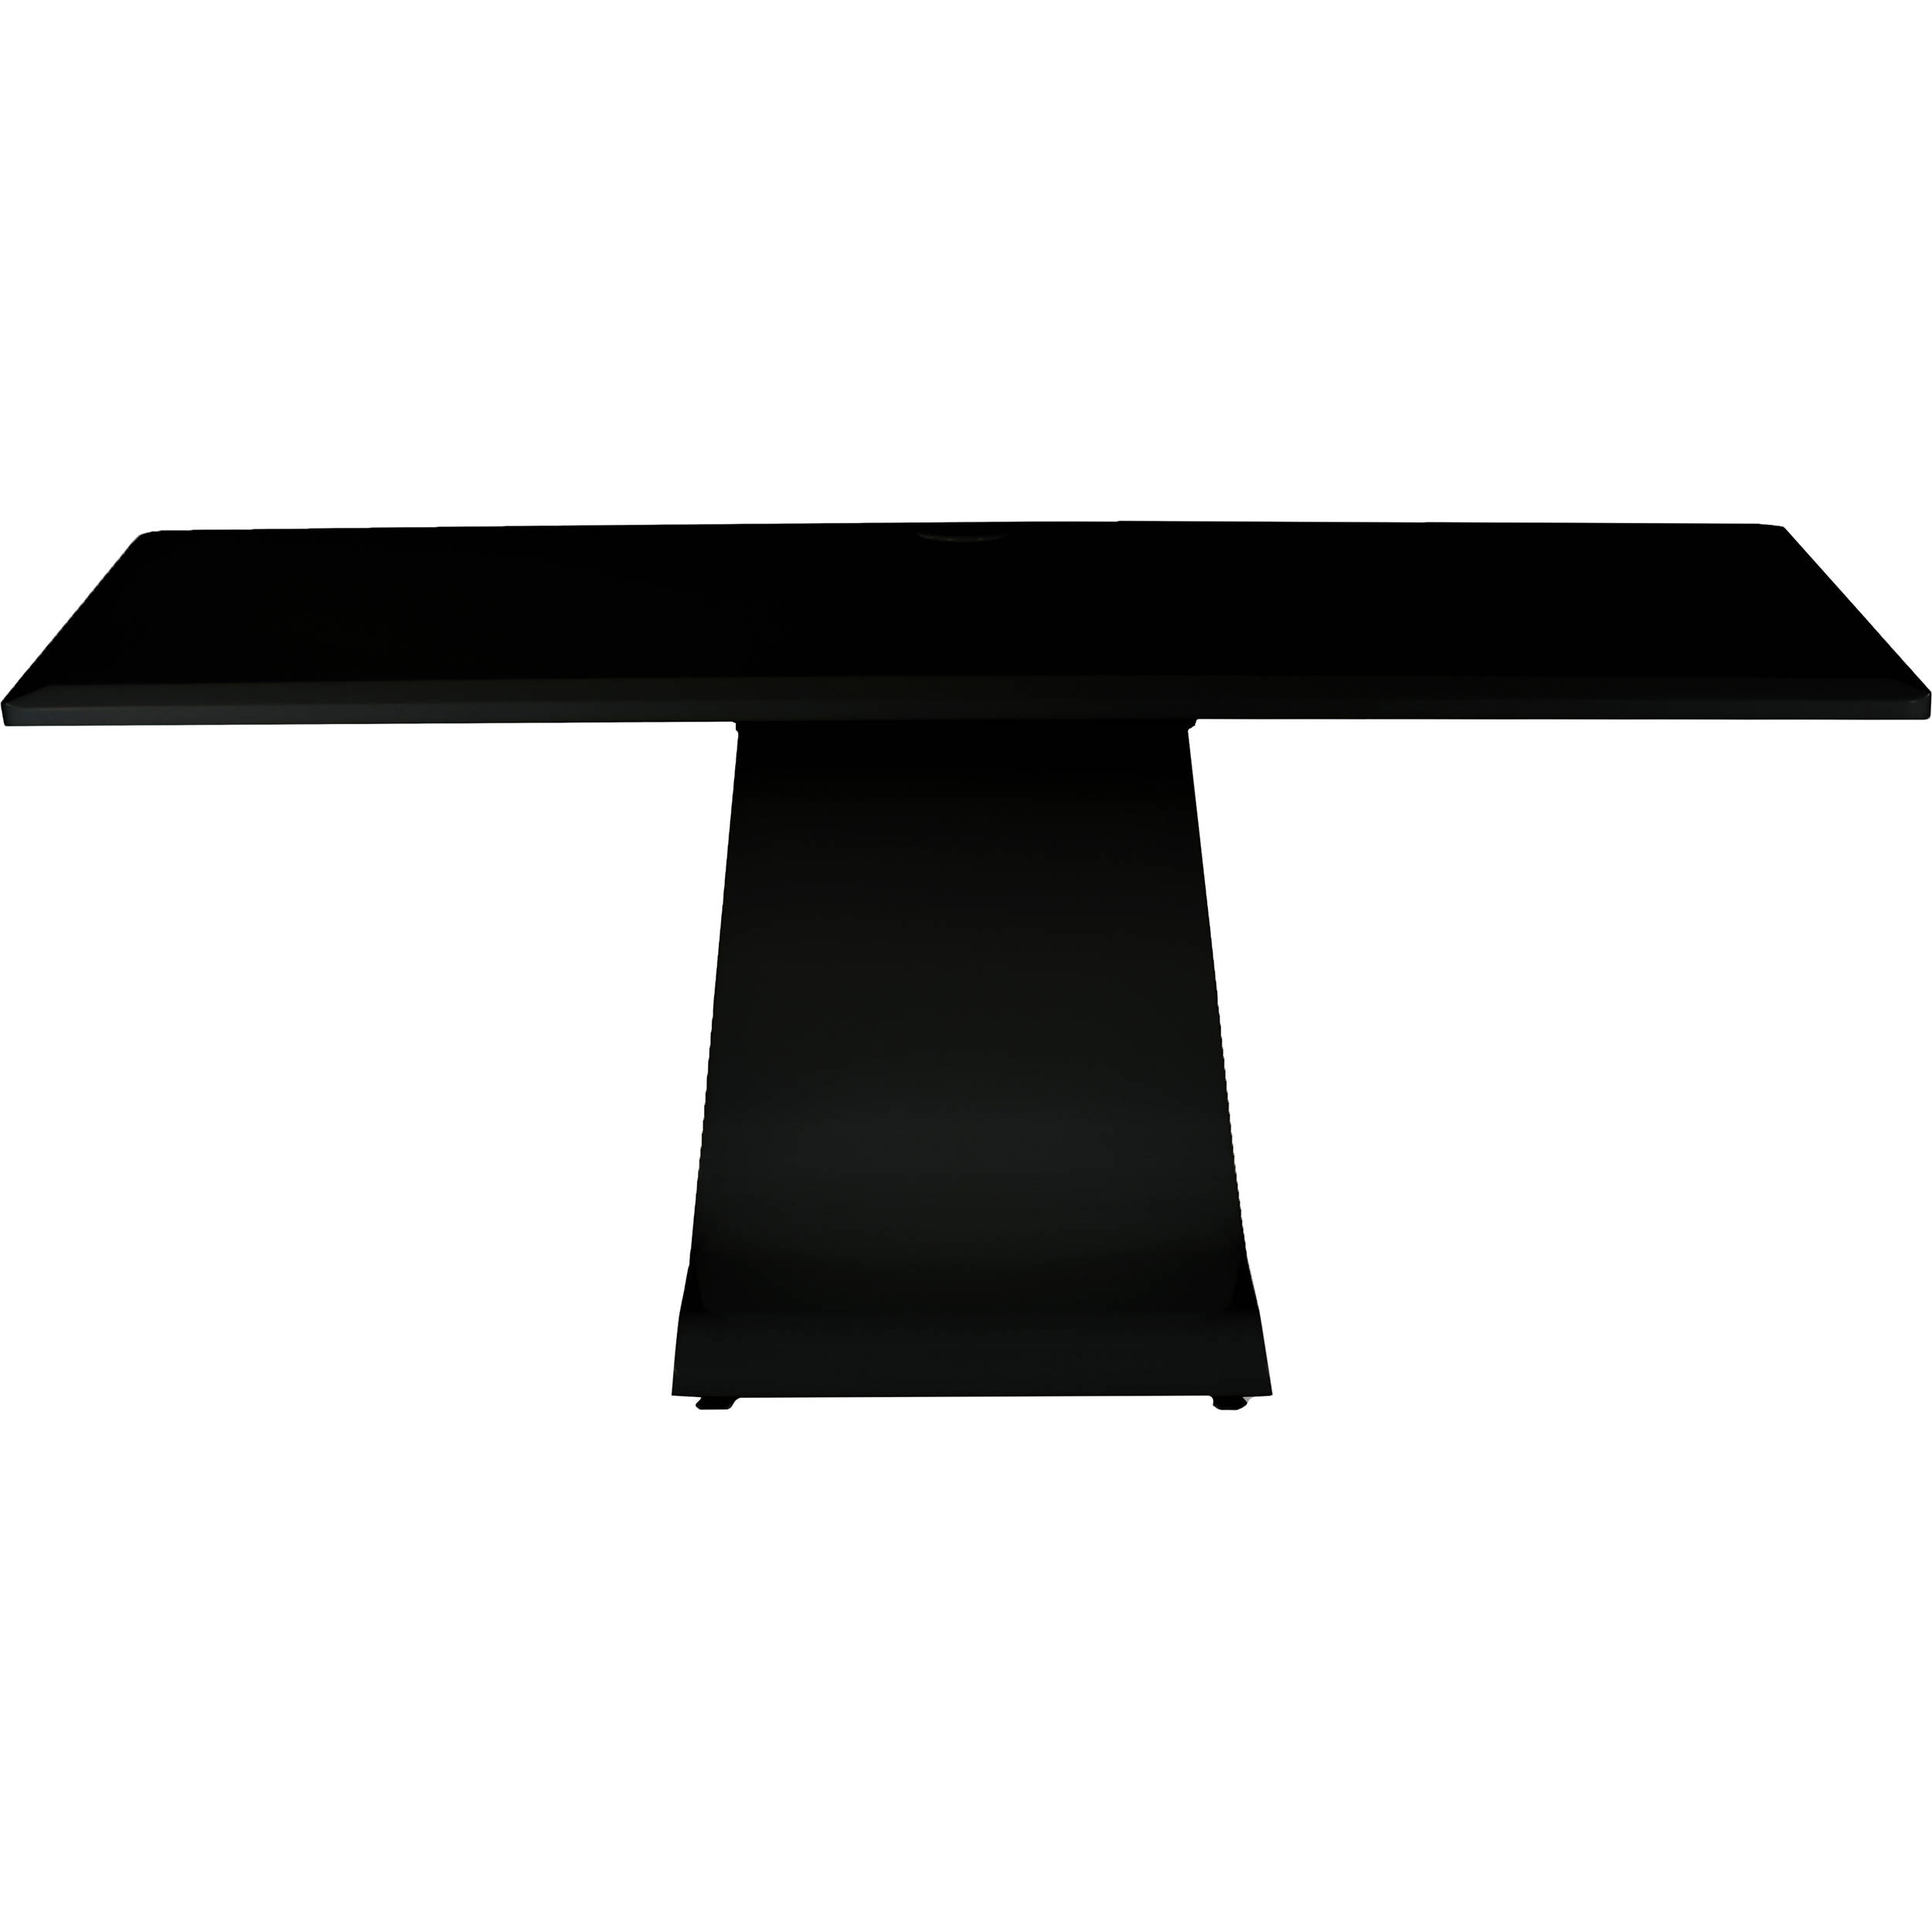 Zaor idesk plain (black matte) ws ide pl bm b&h photo video